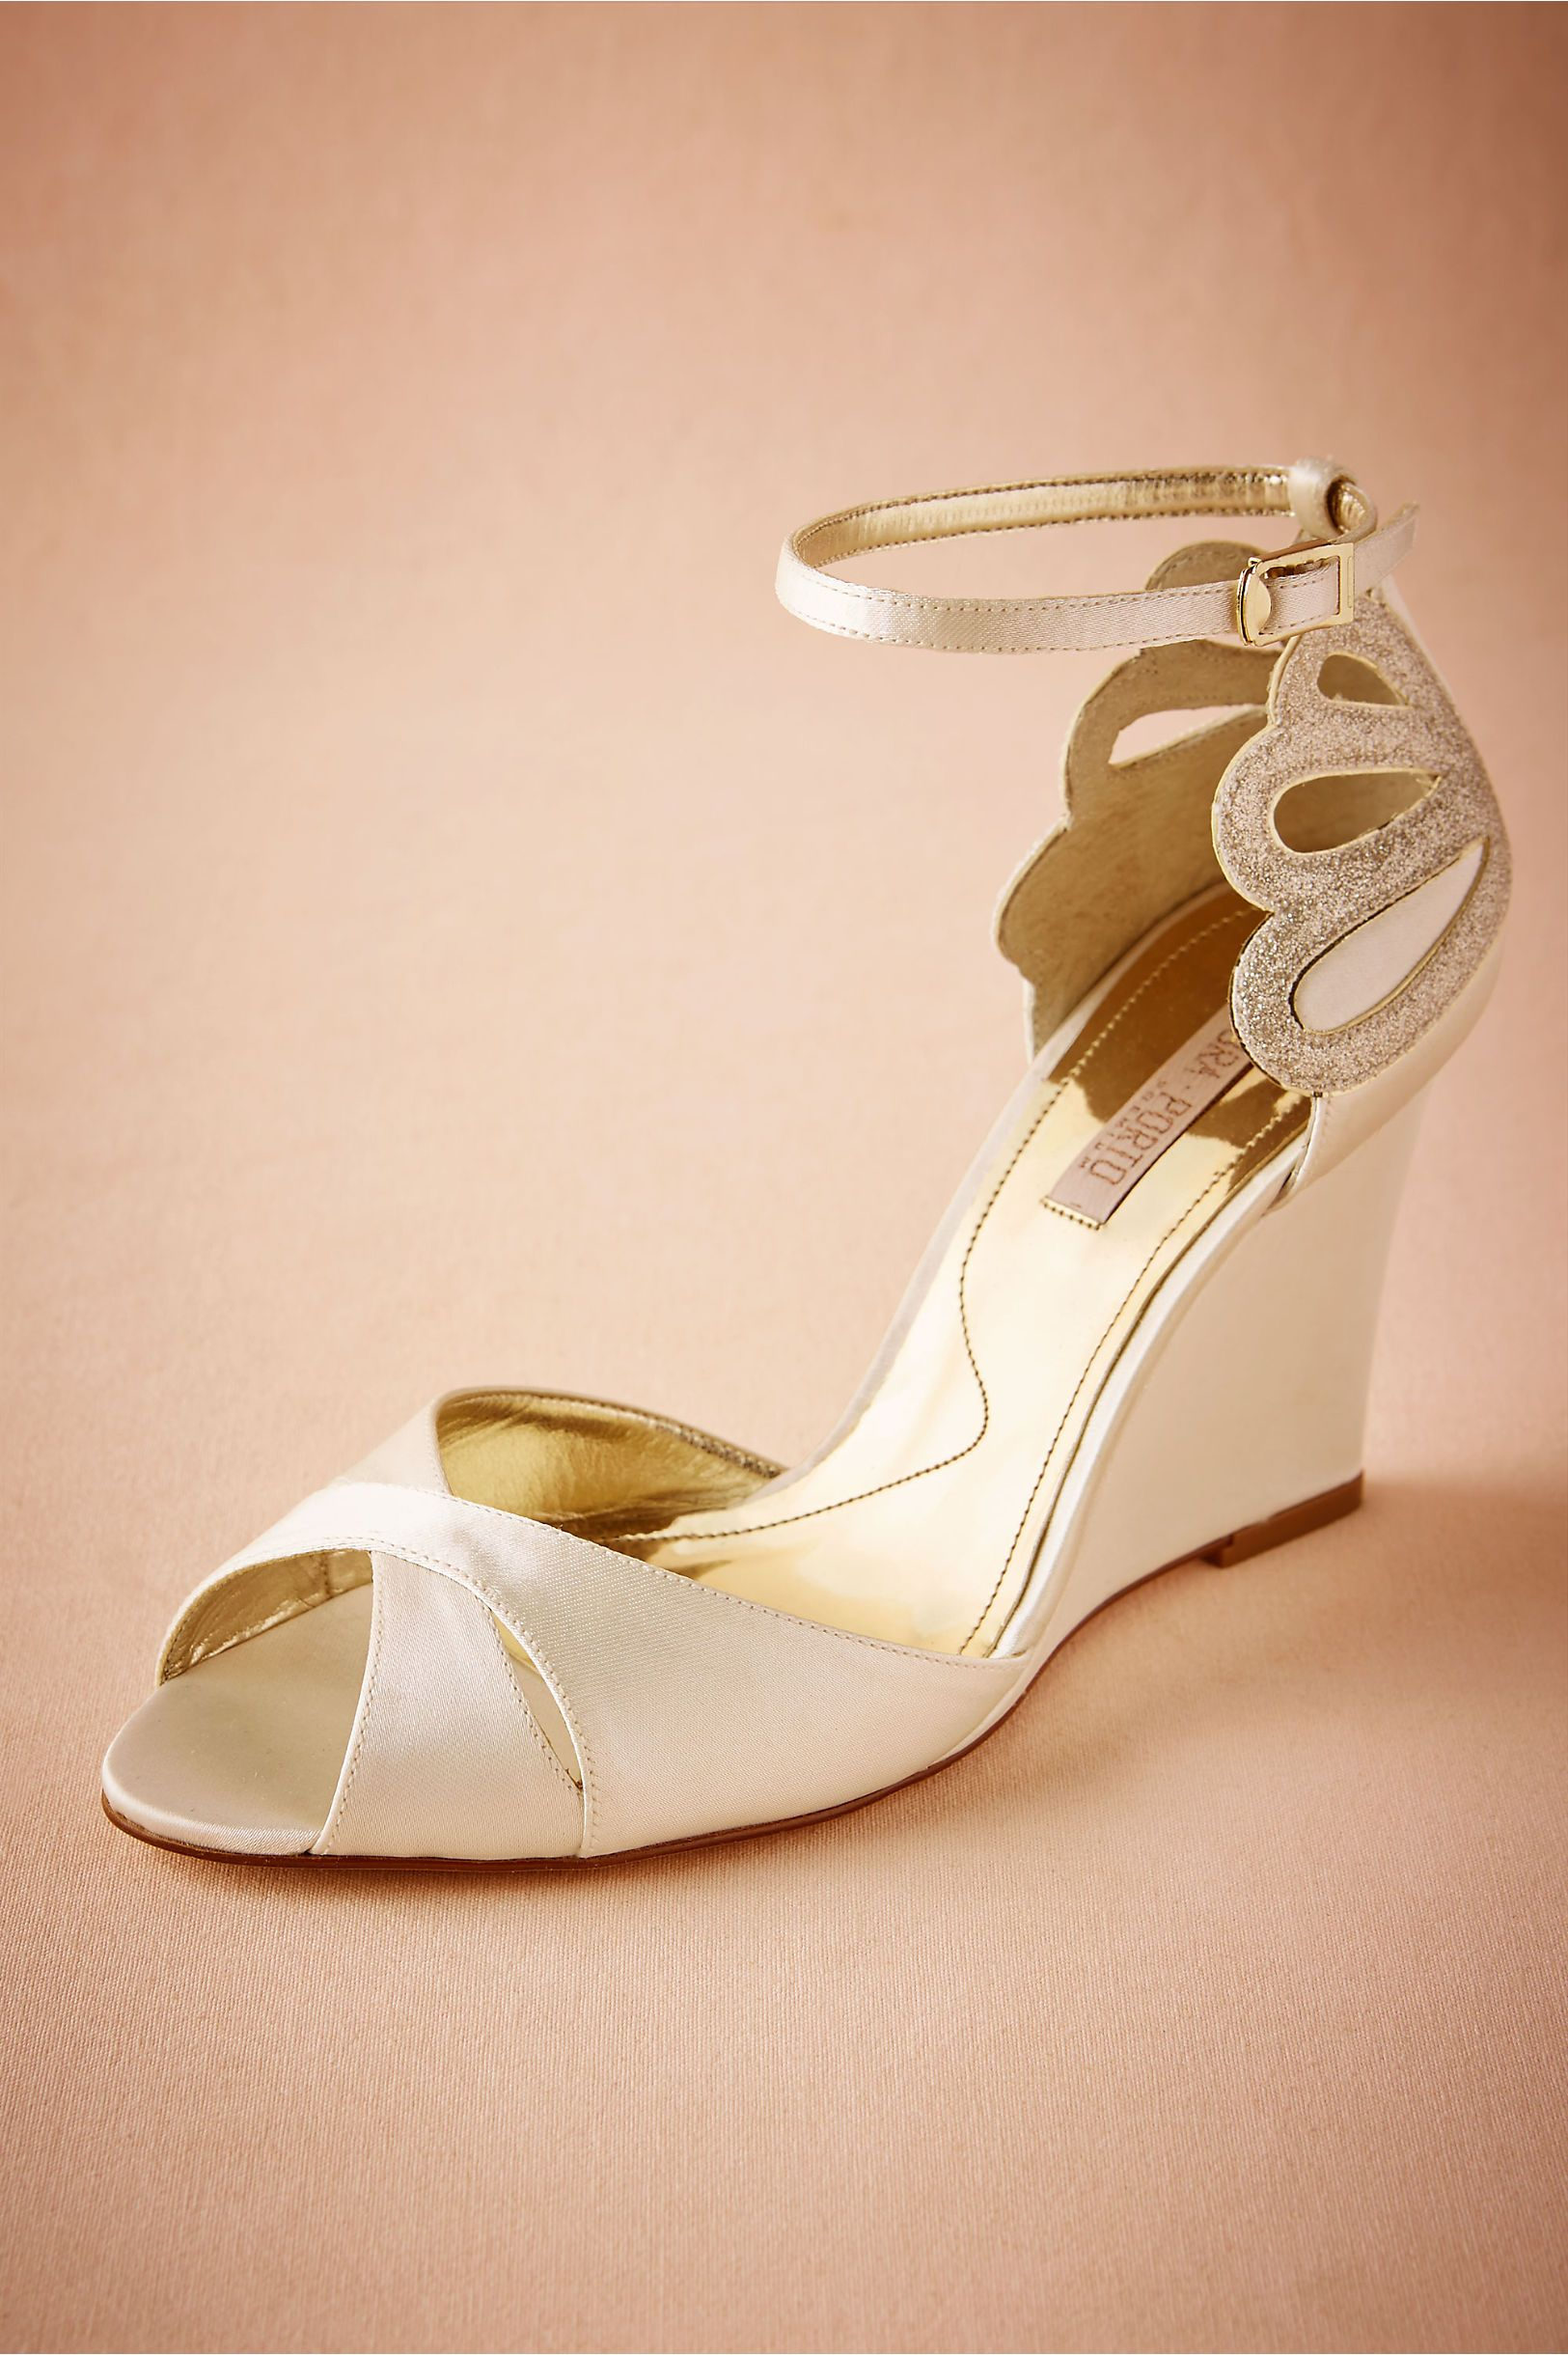 43511dbf5 BHLDN De Mer Wedges in Bride Bridal Shoes   Accessories